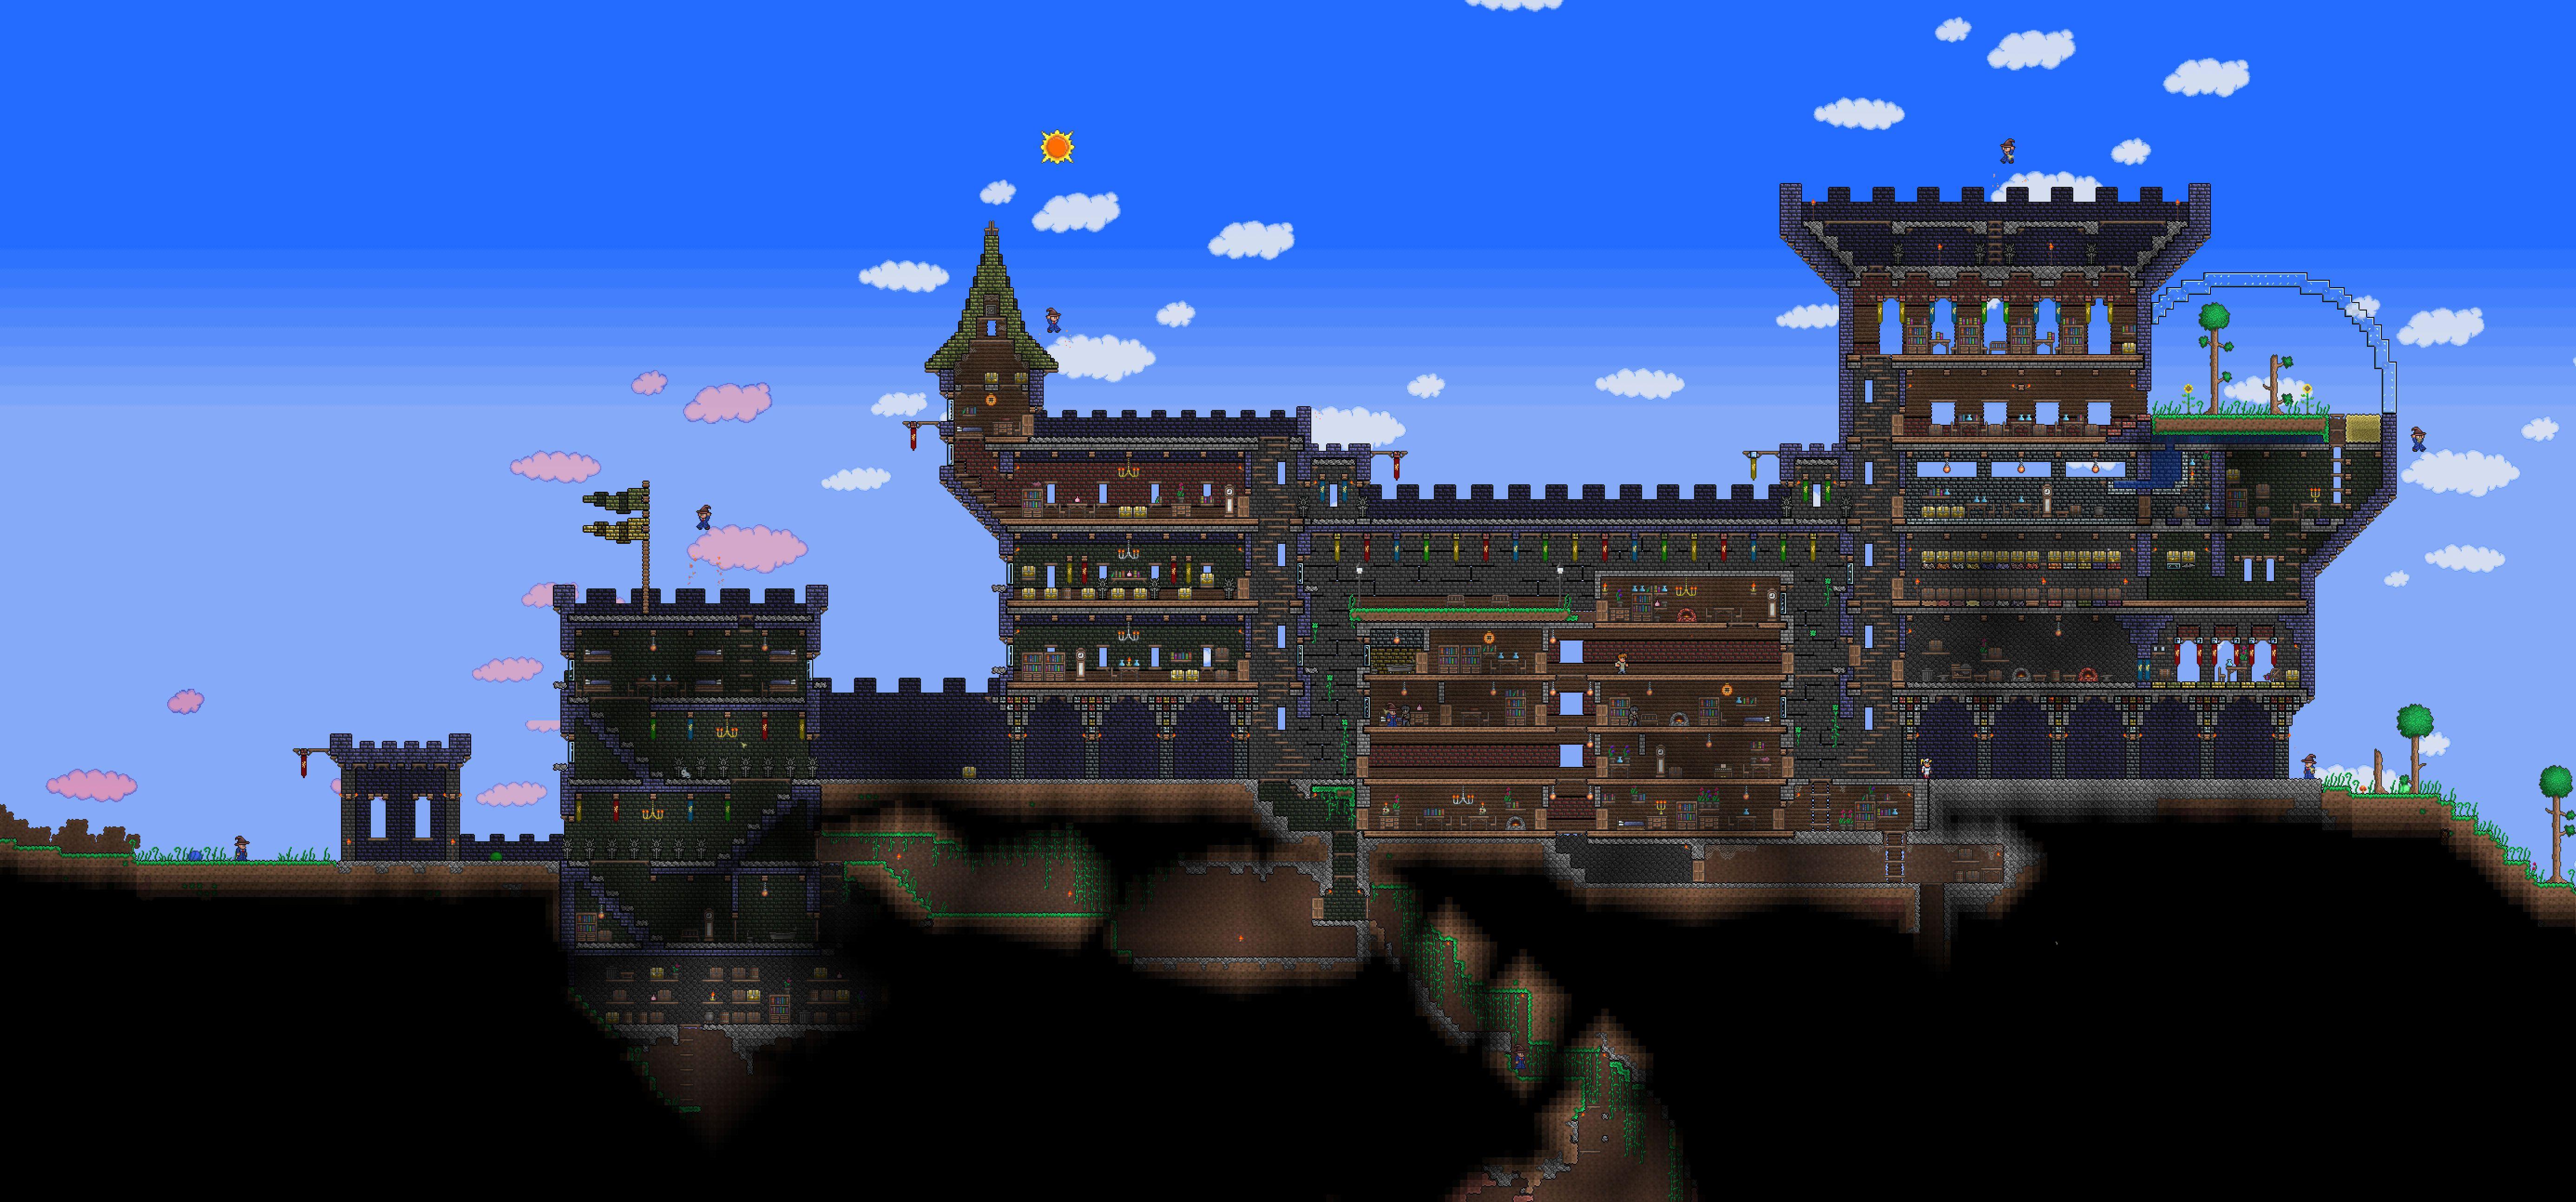 Terraria Castle by Naughty-UK deviantart com on @deviantART